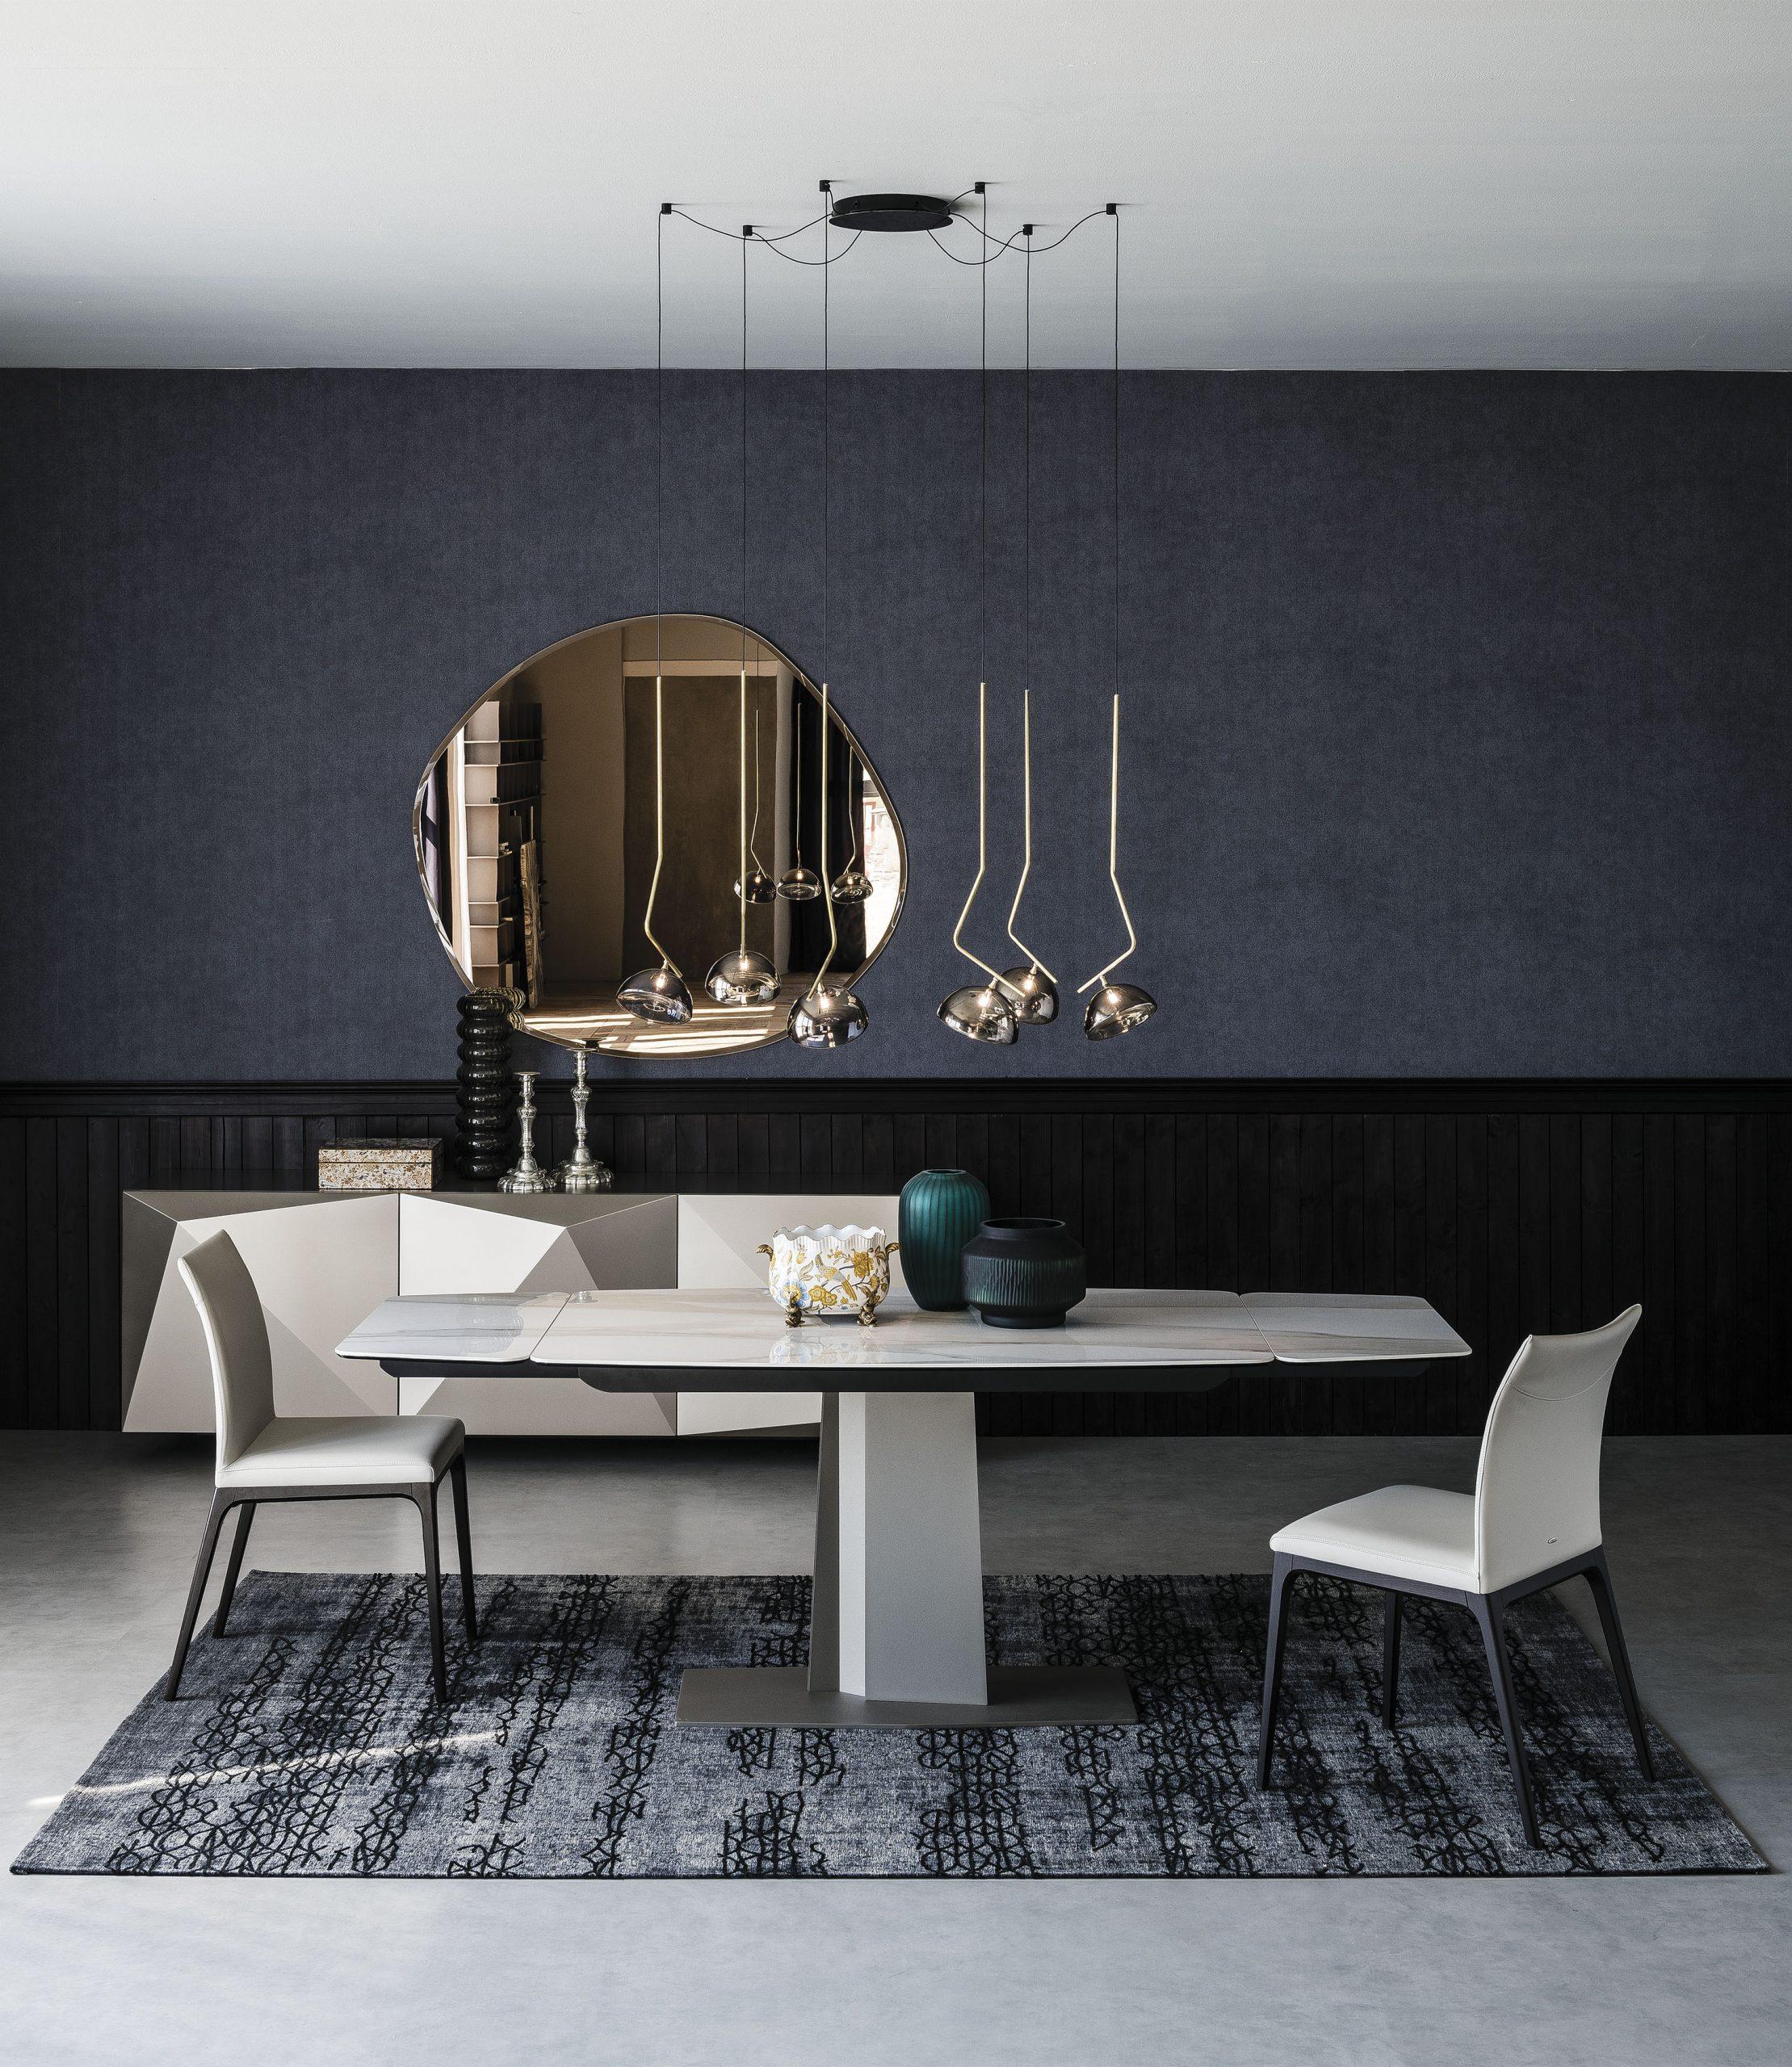 Duffy Keramik Drive餐檯/餐枱/餐桌 dining table